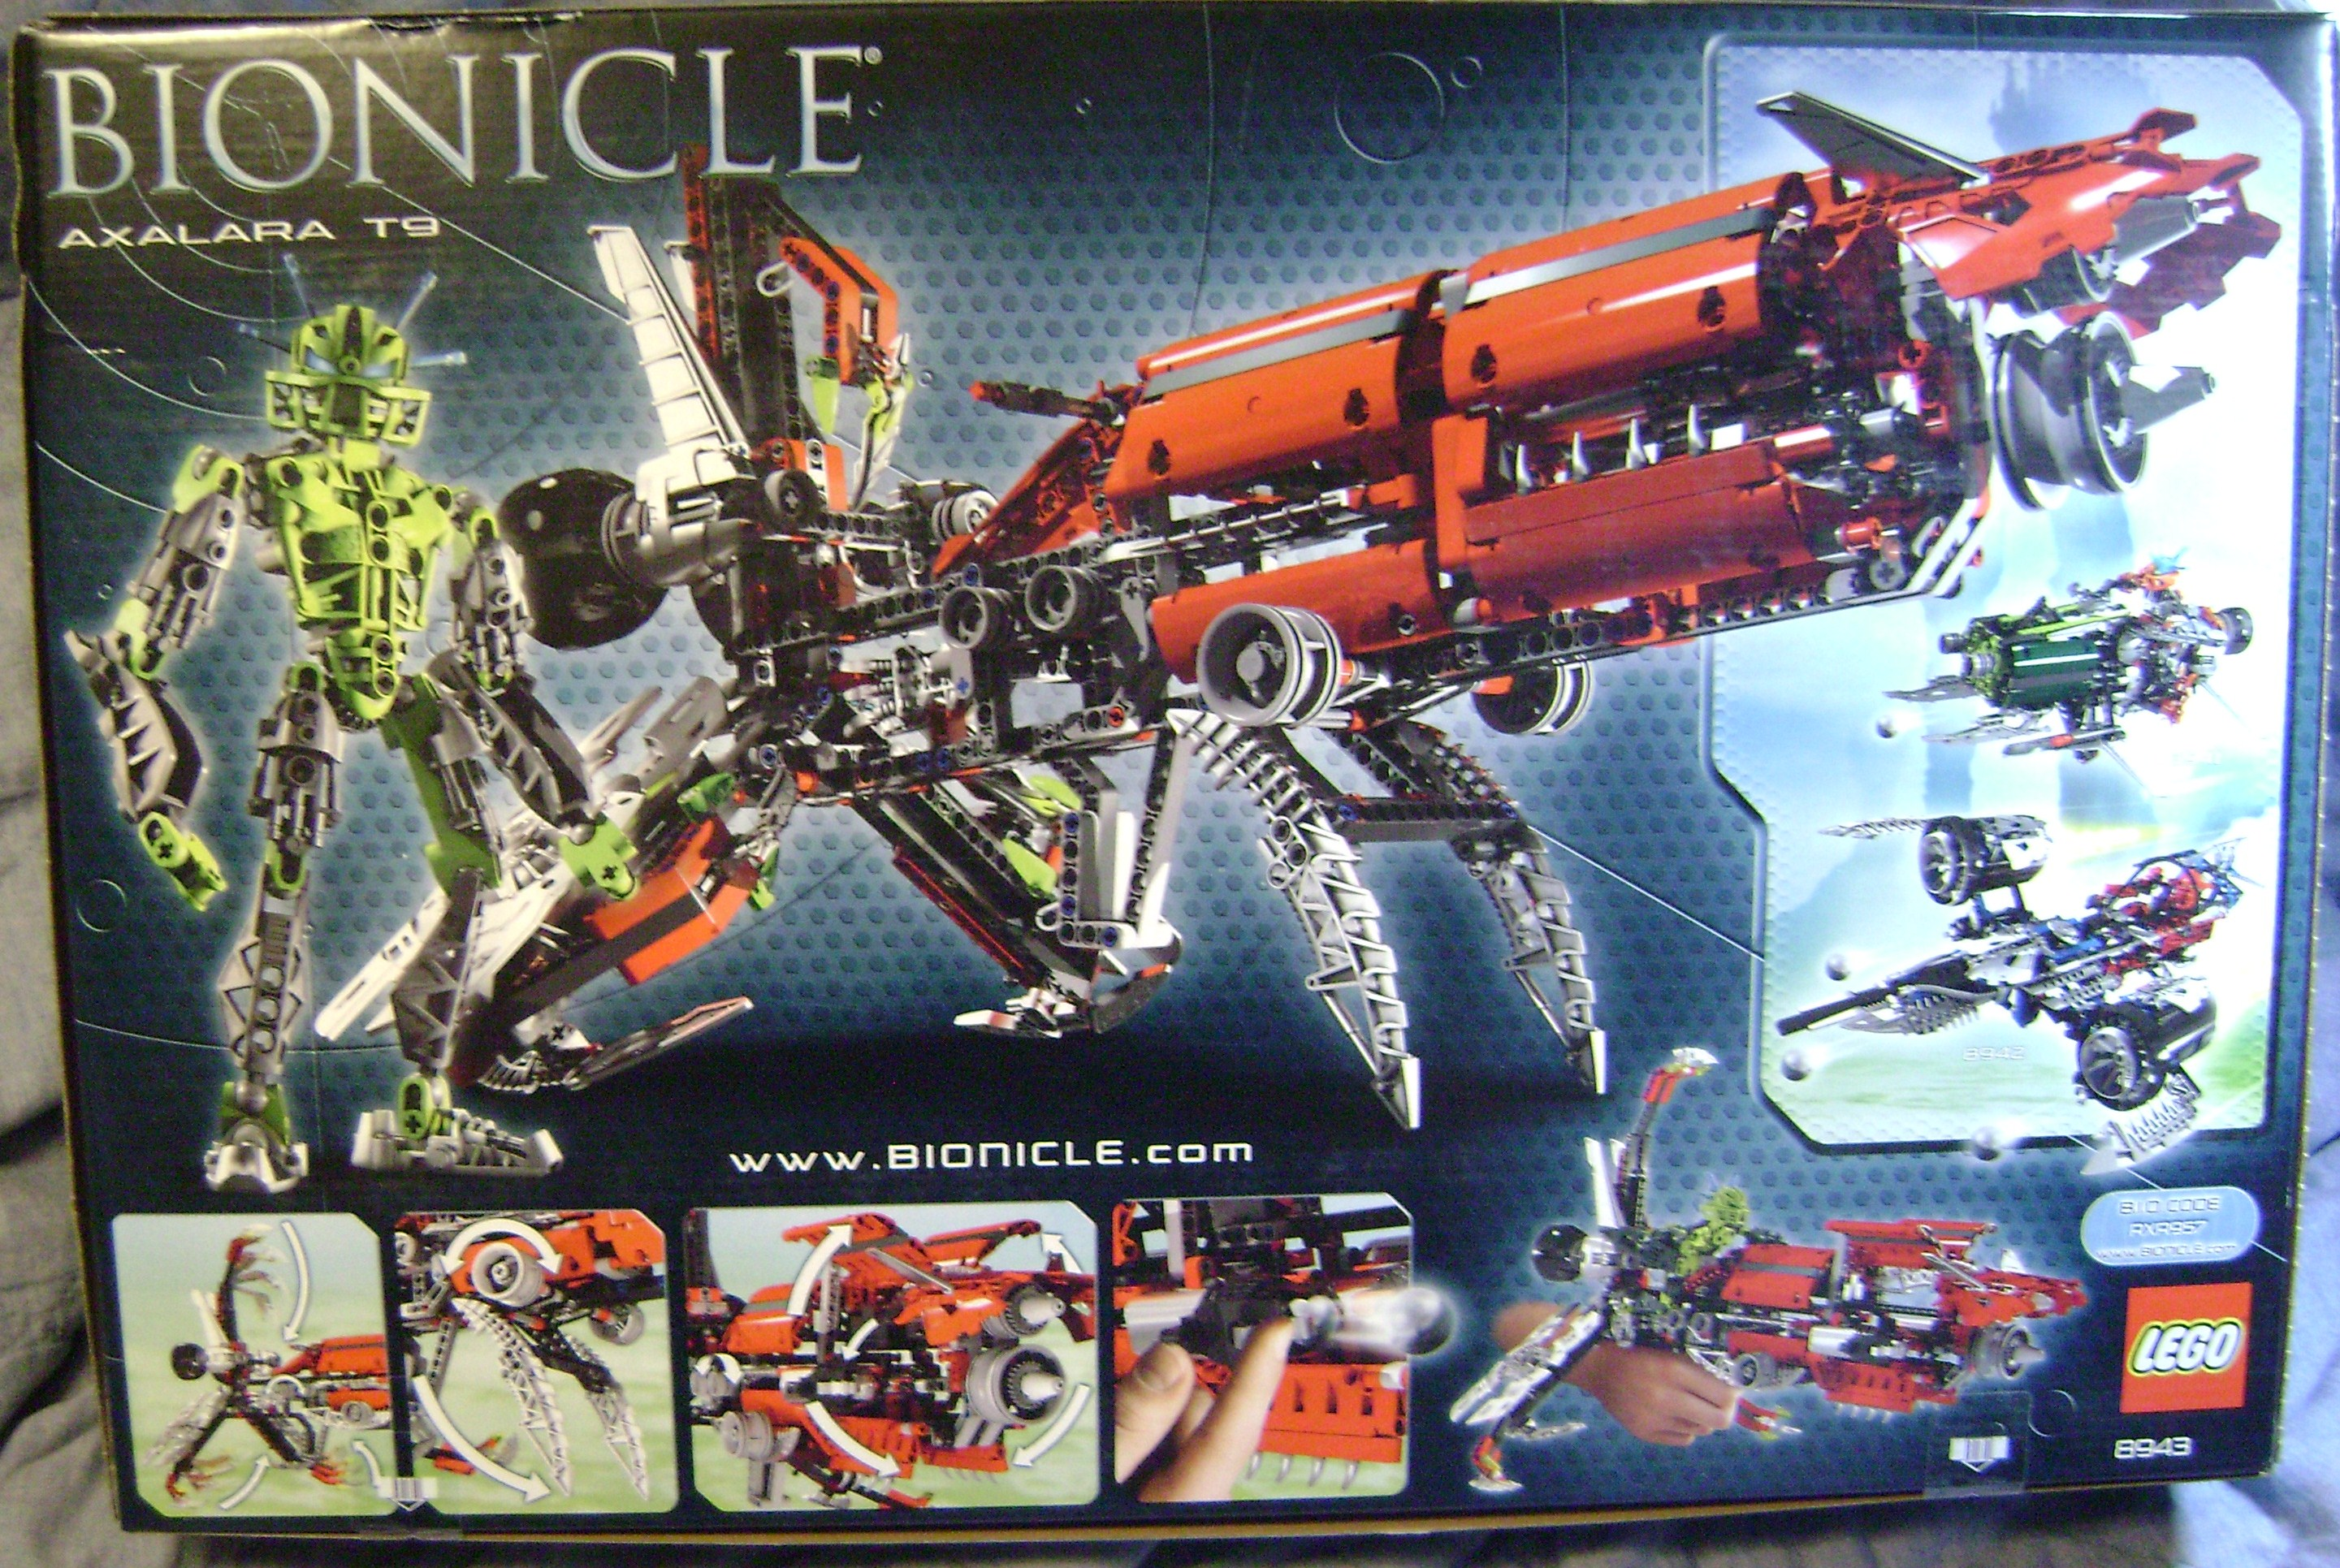 Biggest bionicle set / Cuisinart soda maker